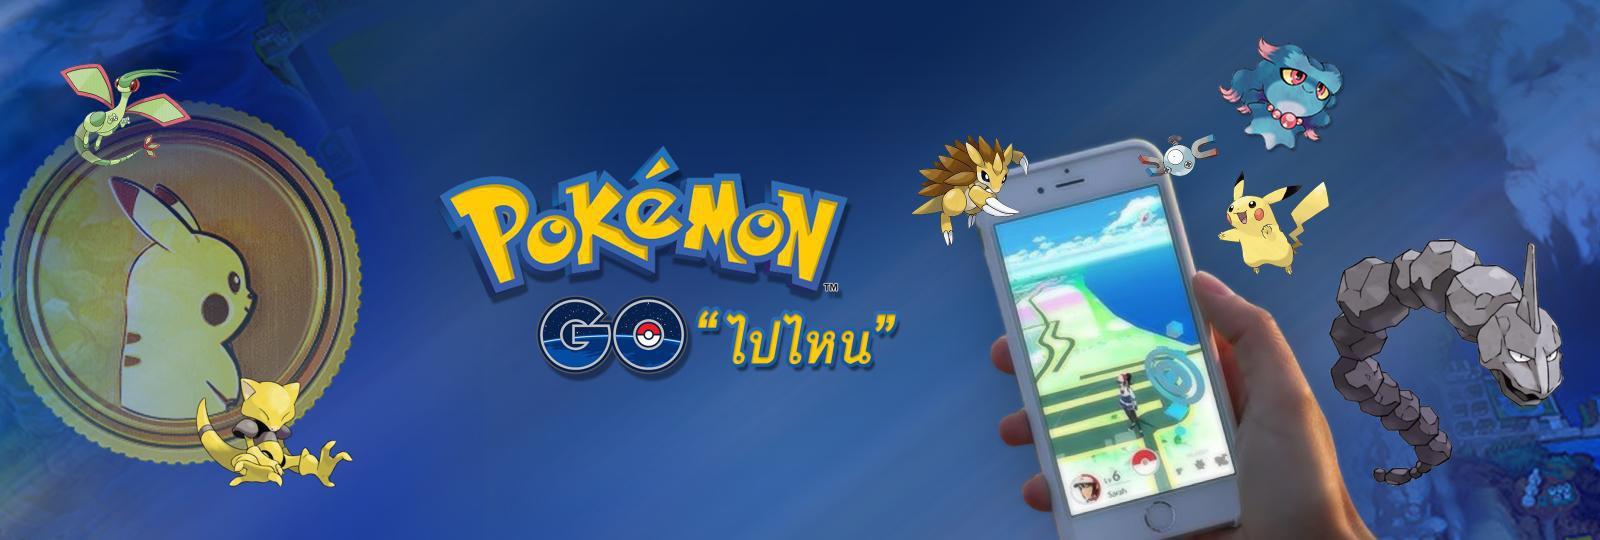 "Pokémon GO ""ไปไหน"""